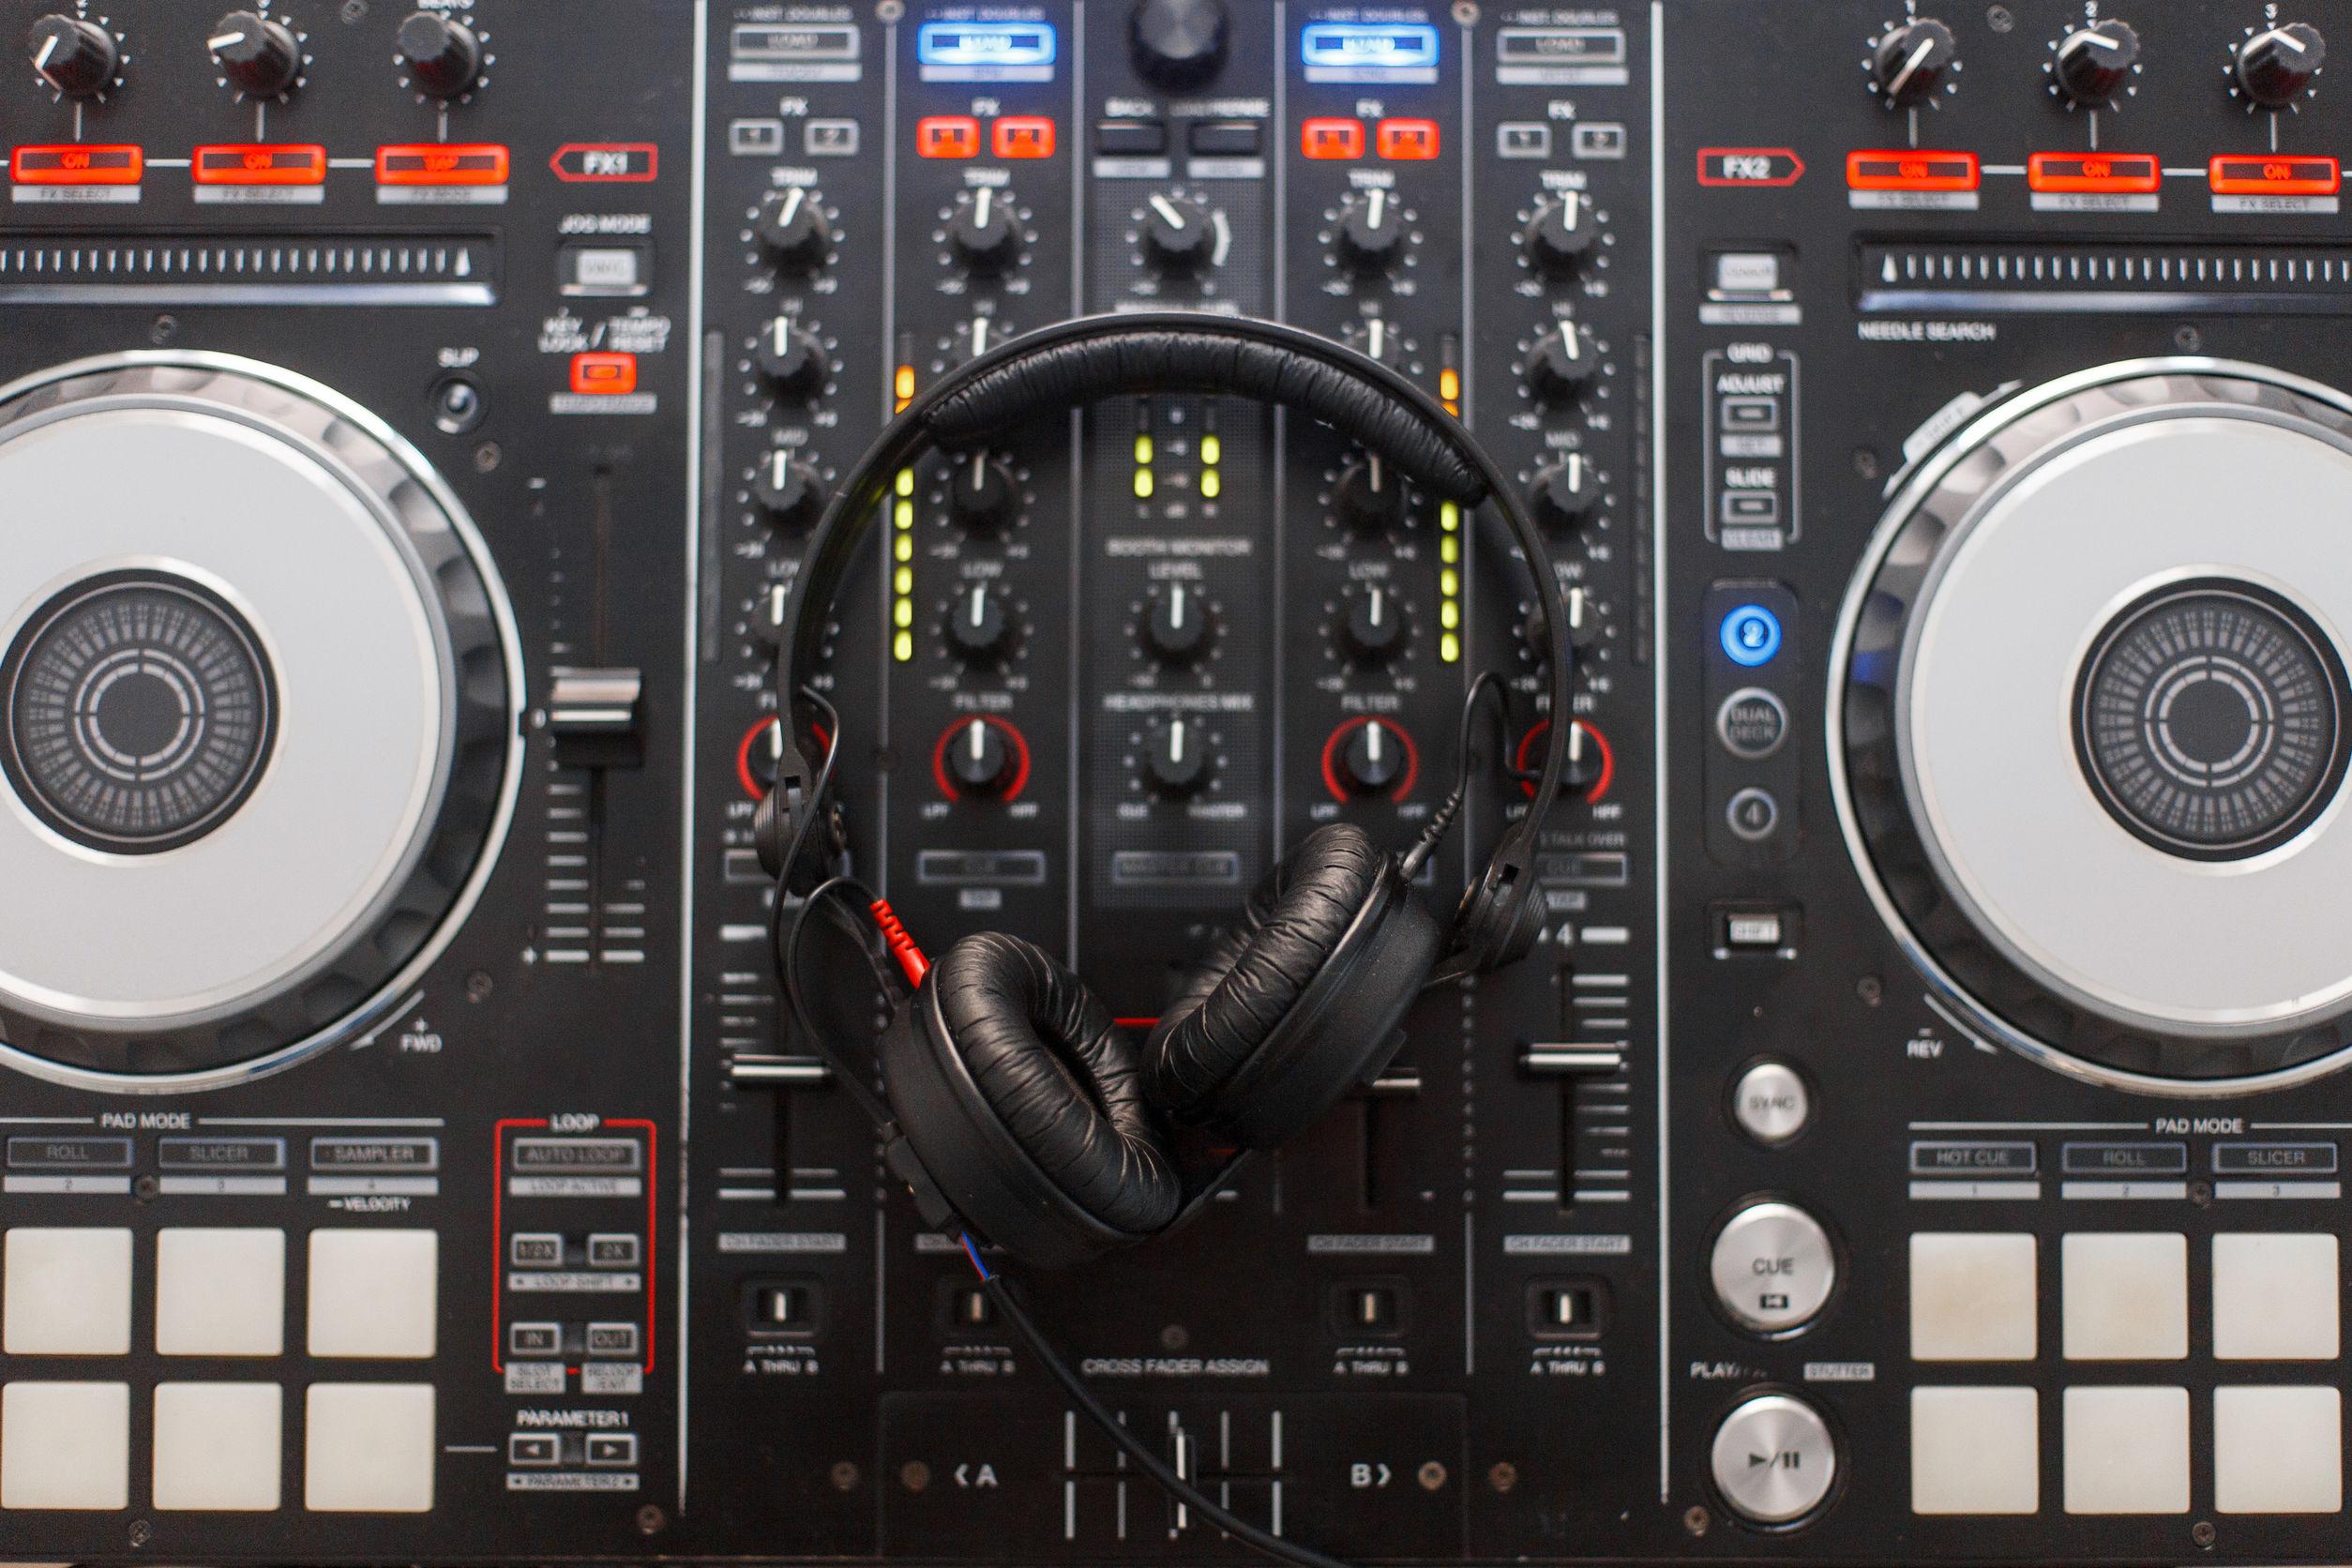 Headphones on a Dj mixer